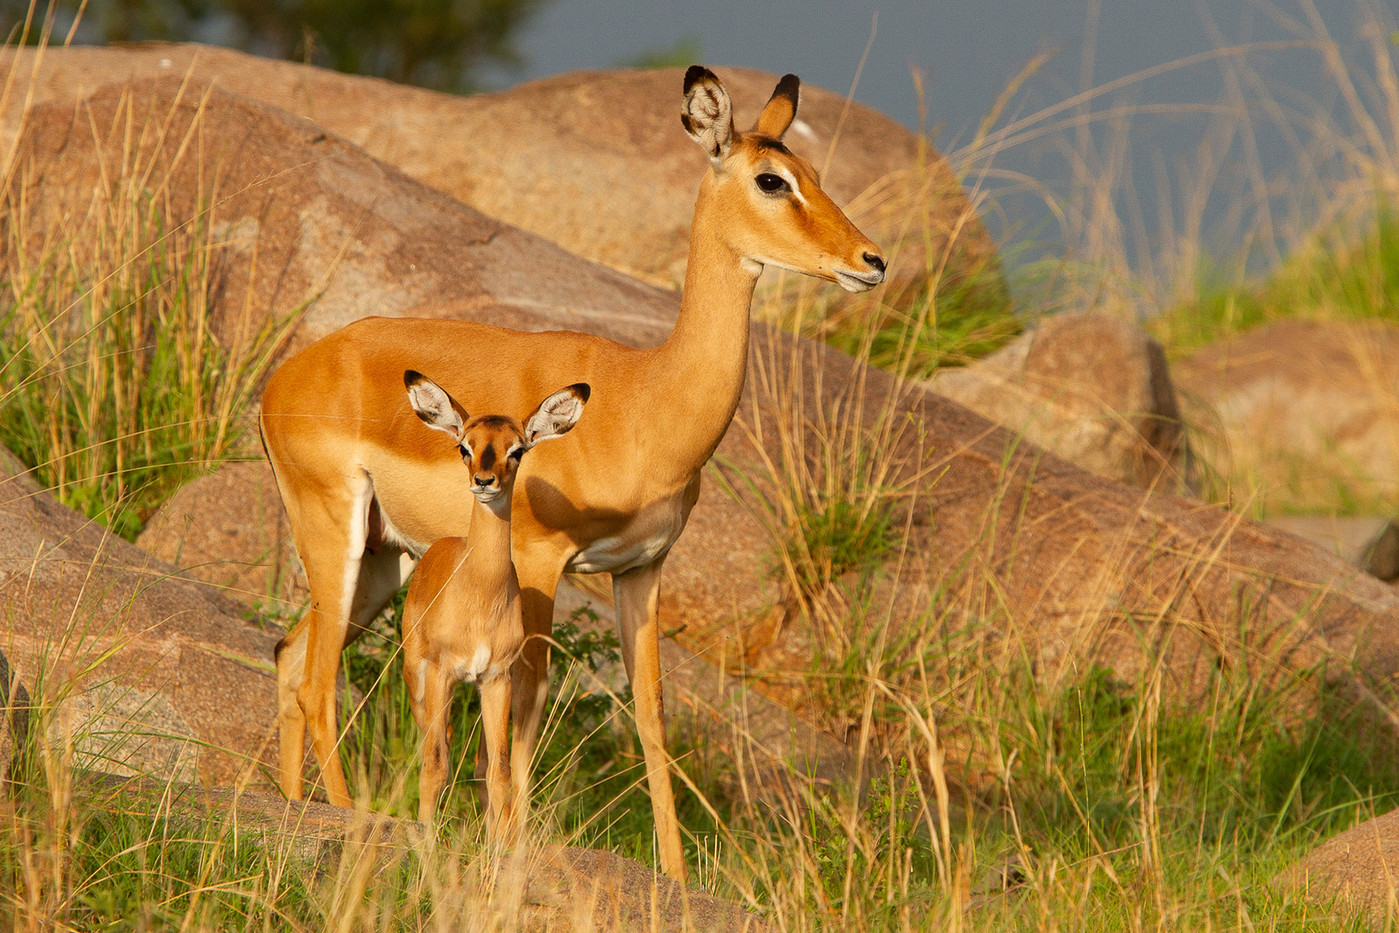 Impala & calf in the Serengeti NP, Tanzania